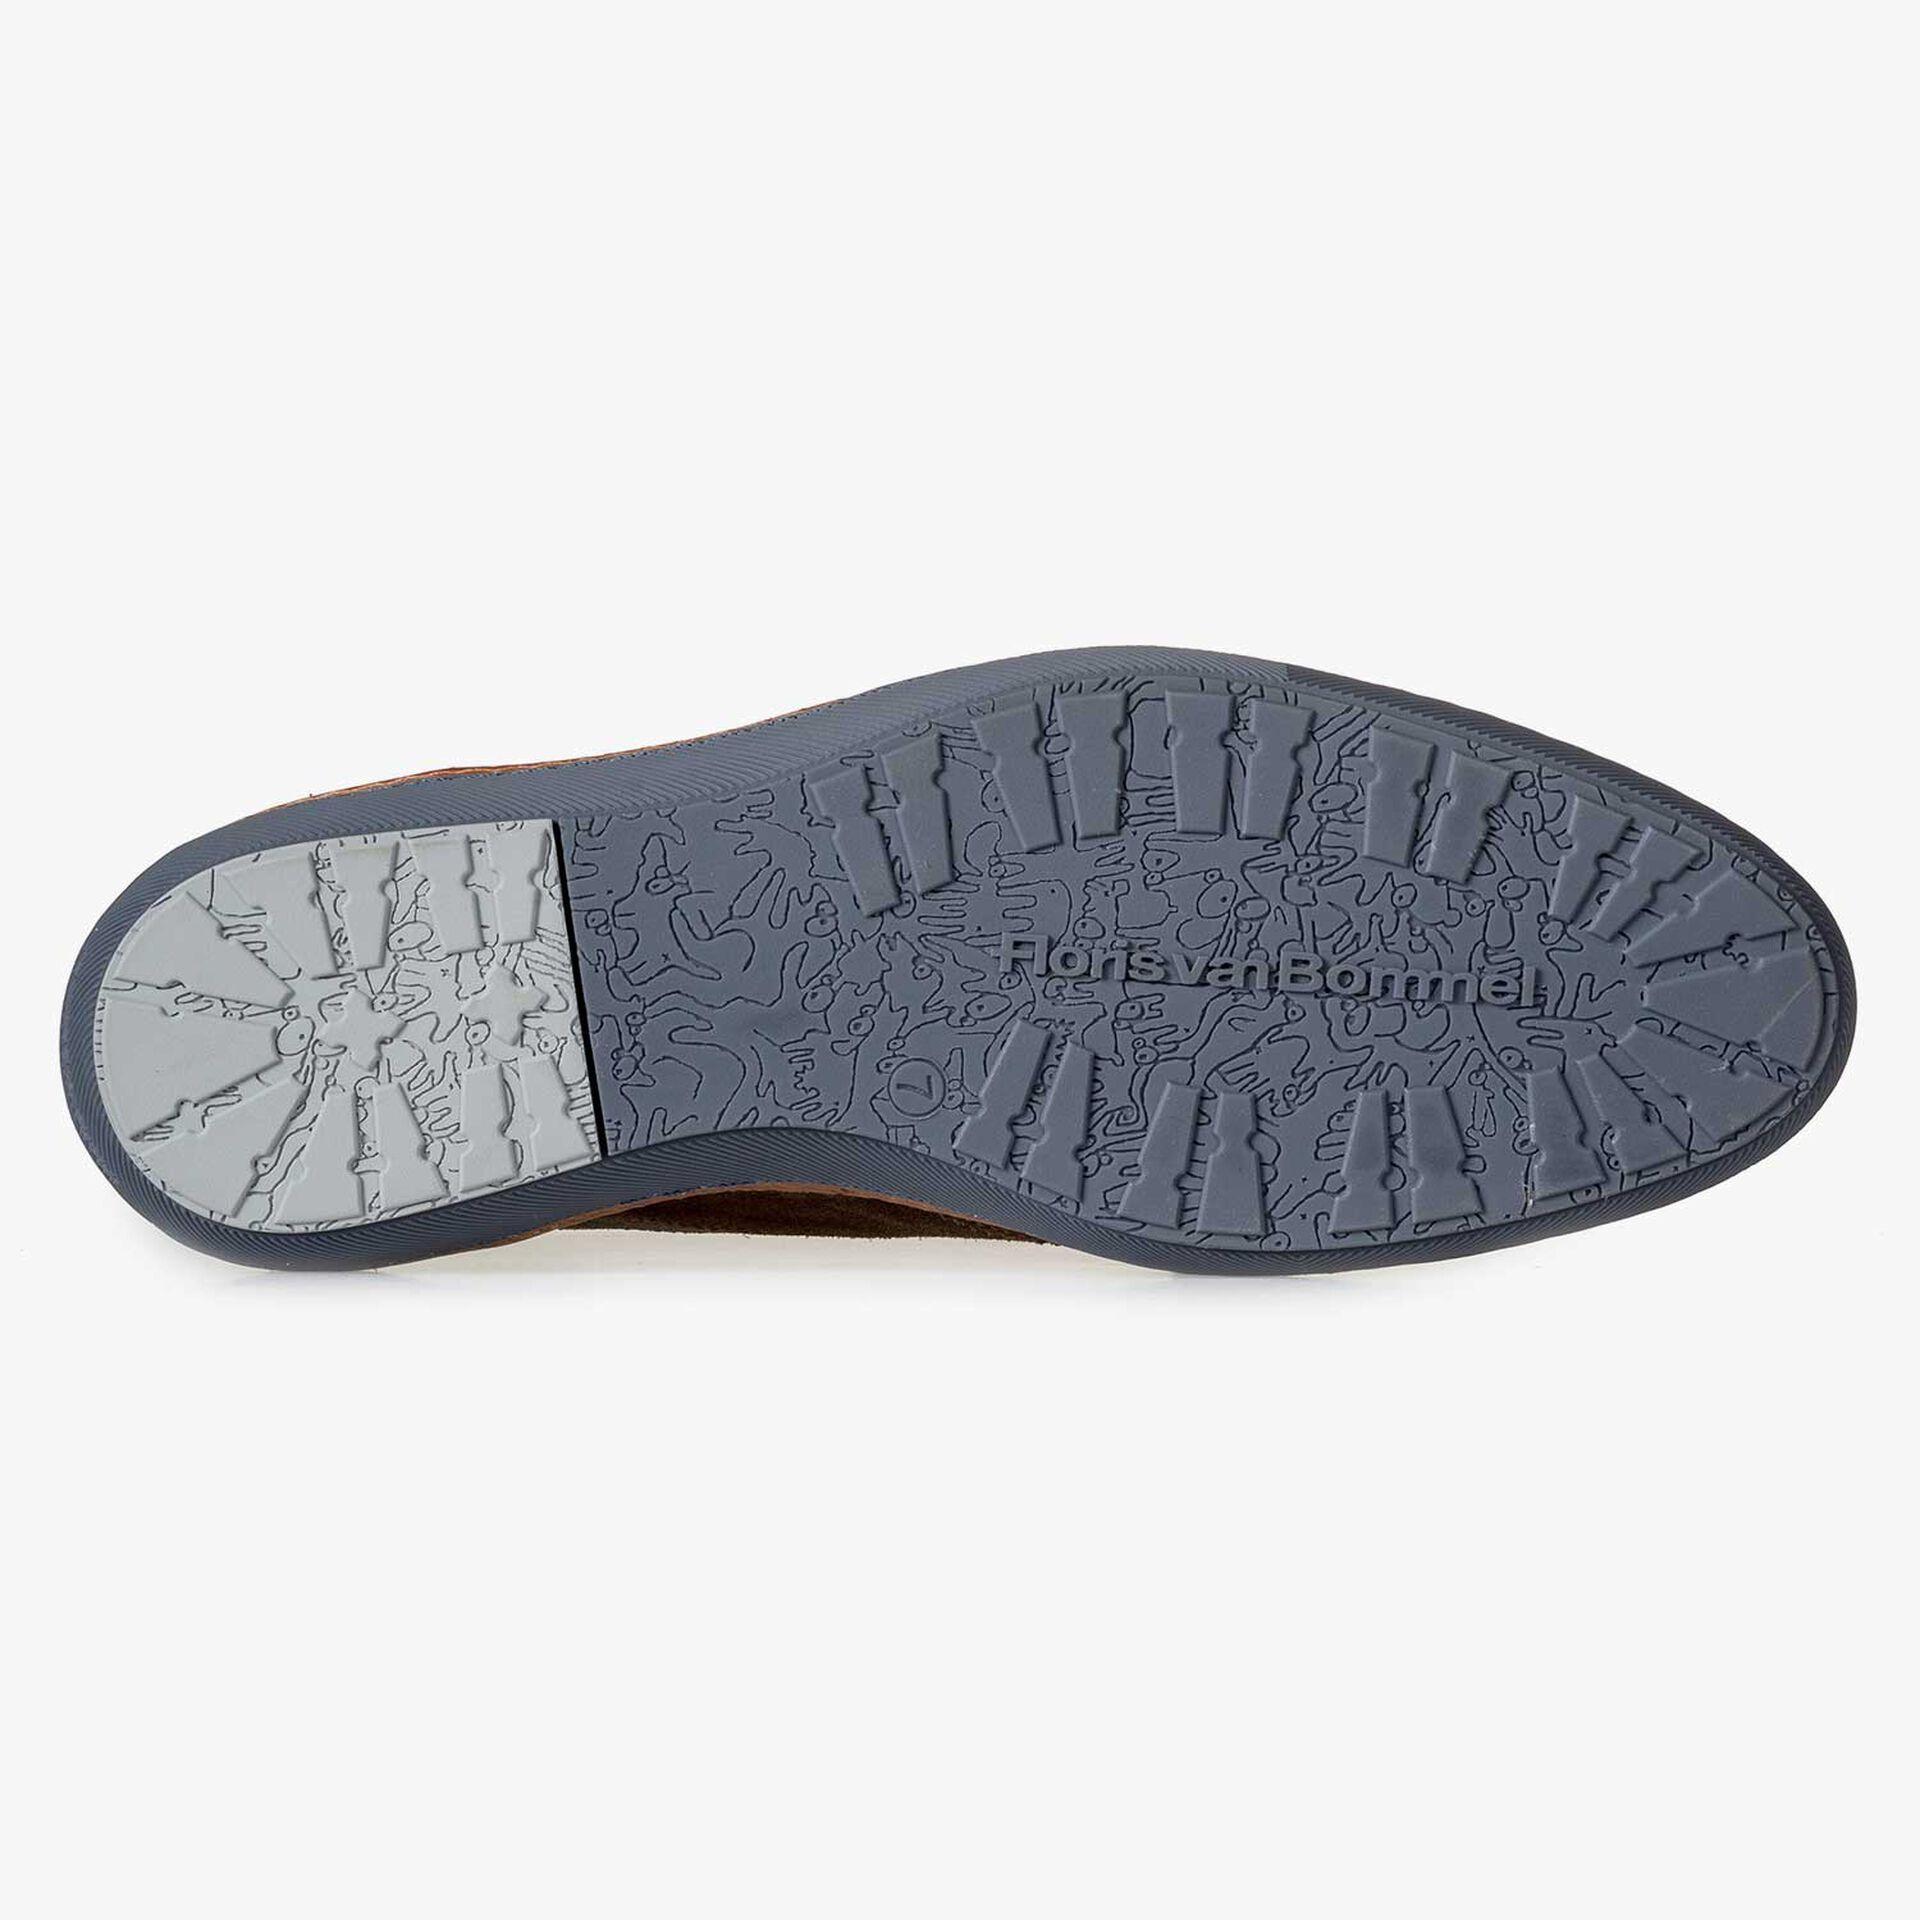 Brown calf's suede leather brogue sneaker